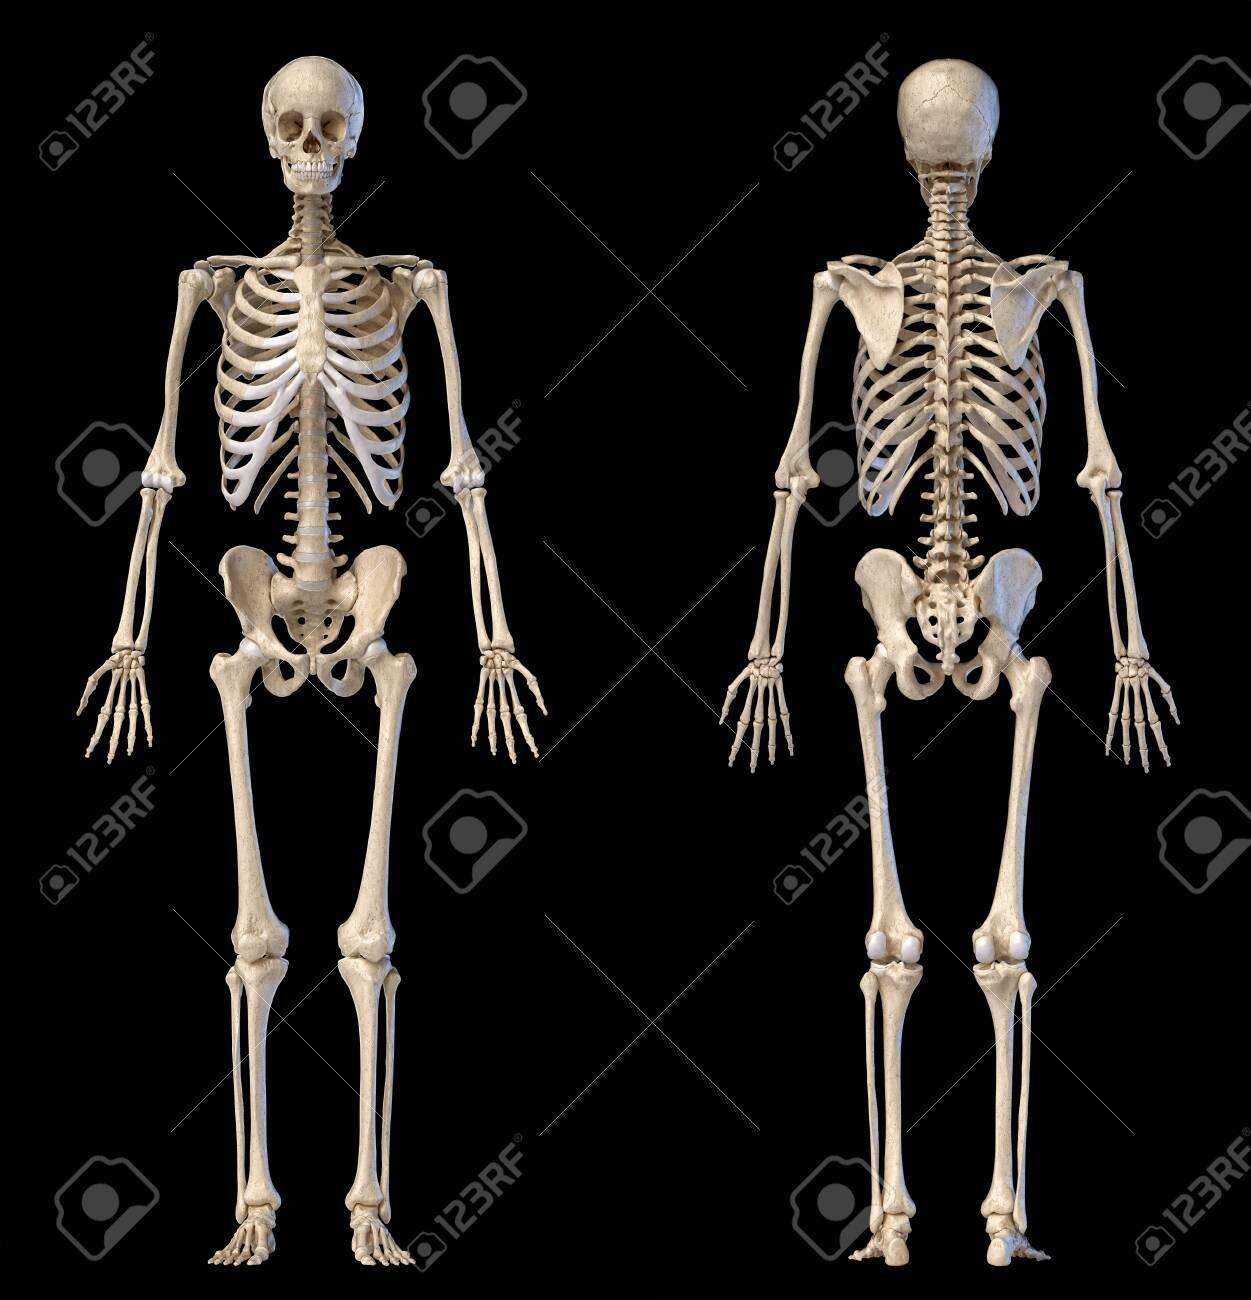 diagram of male skeleton human anatomy full body male skeleton front and rear views on  human anatomy full body male skeleton